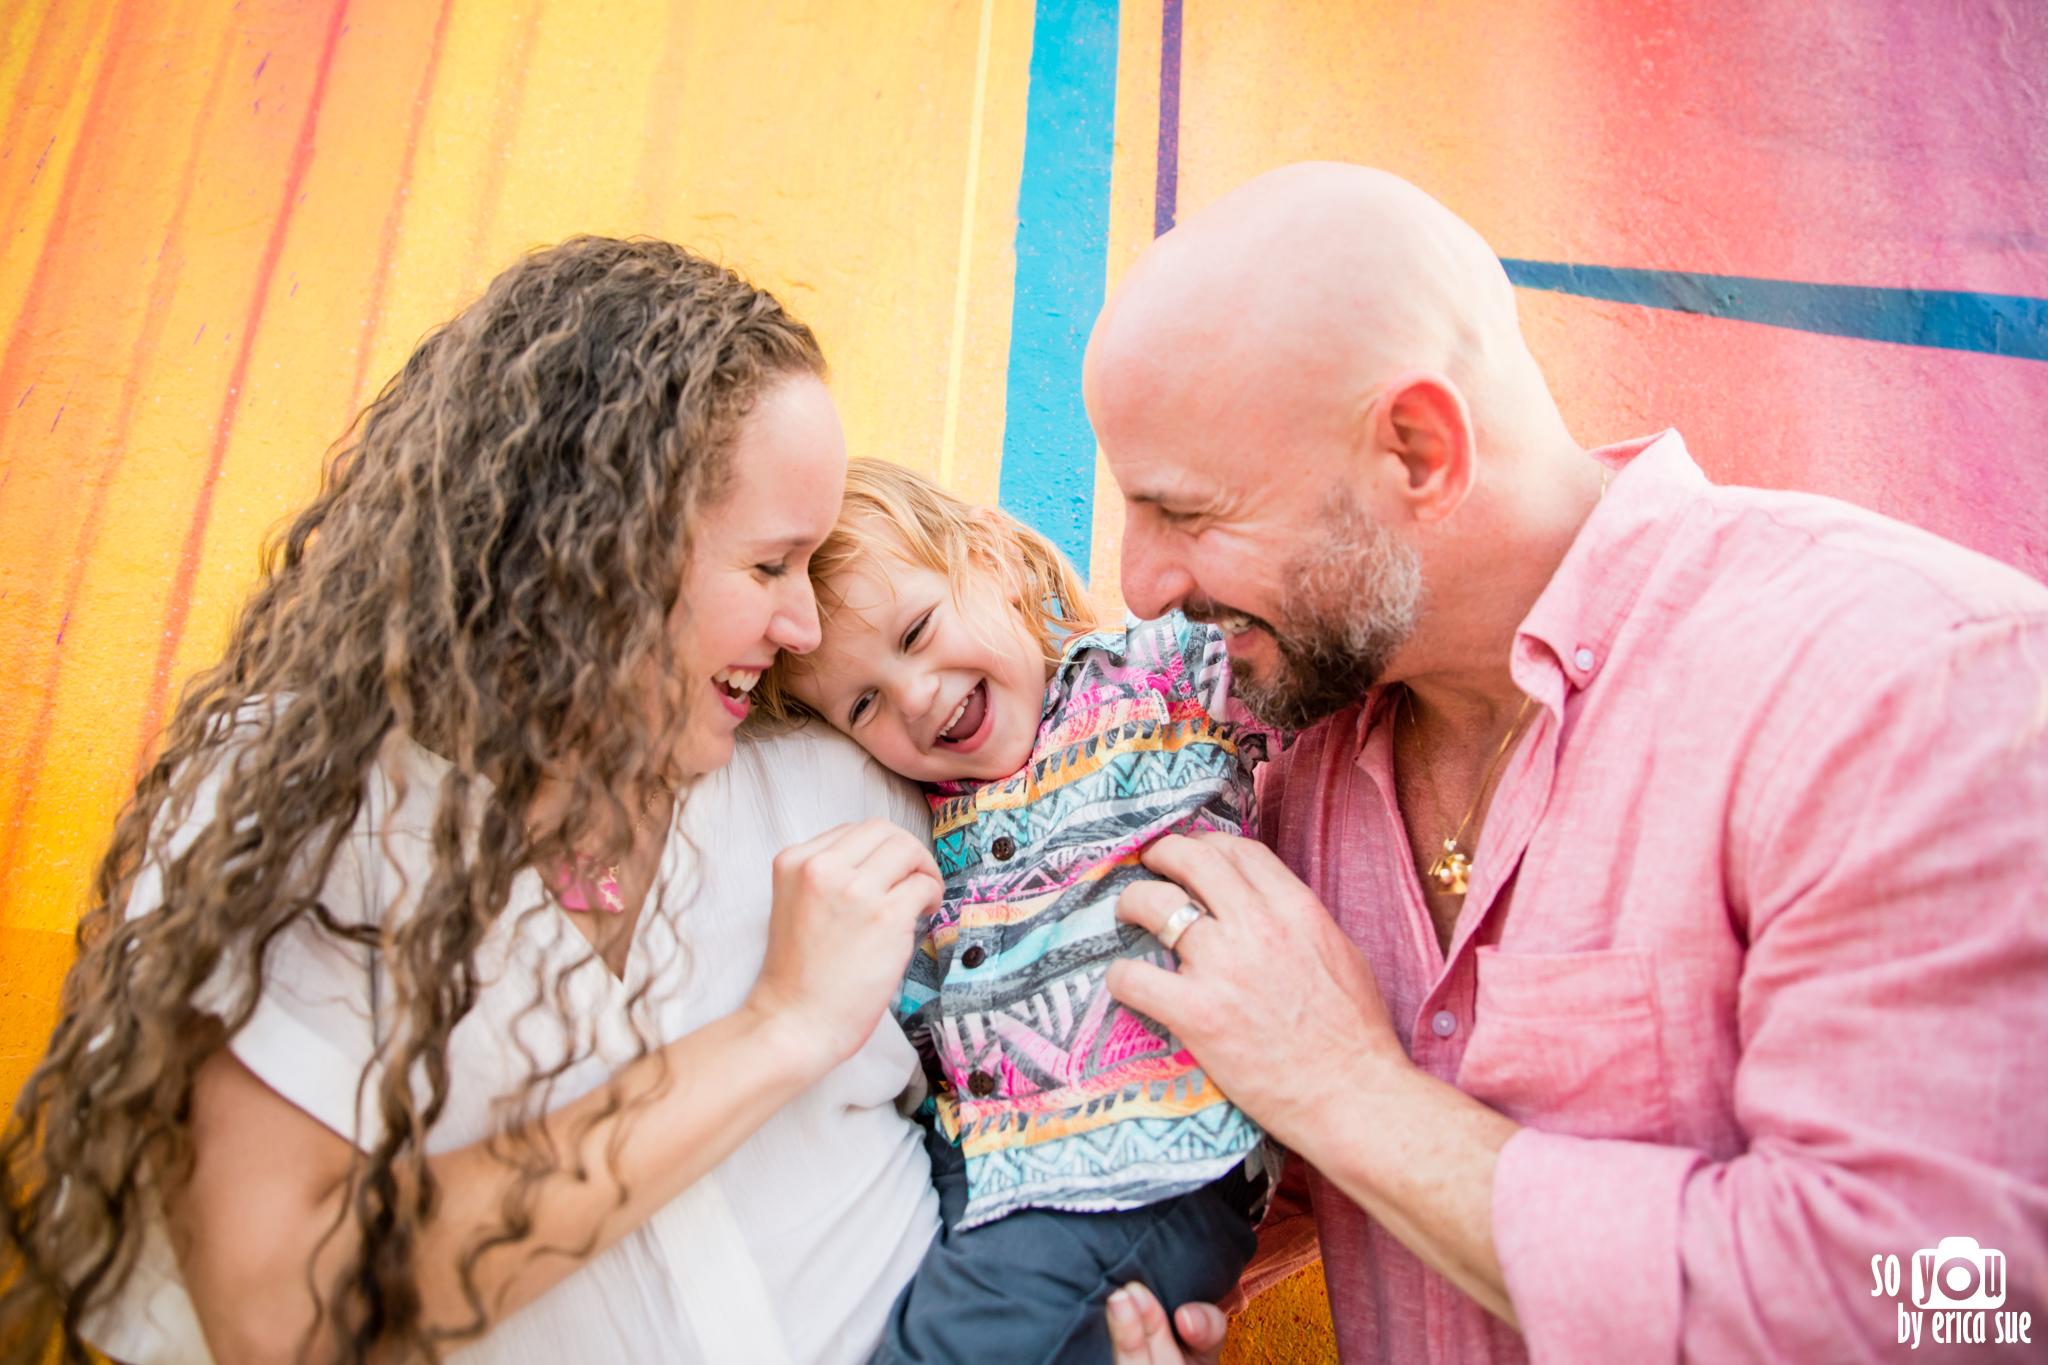 so-you-by-erica-wynwood-photo-shoot-family-photography-miami-7670.jpg